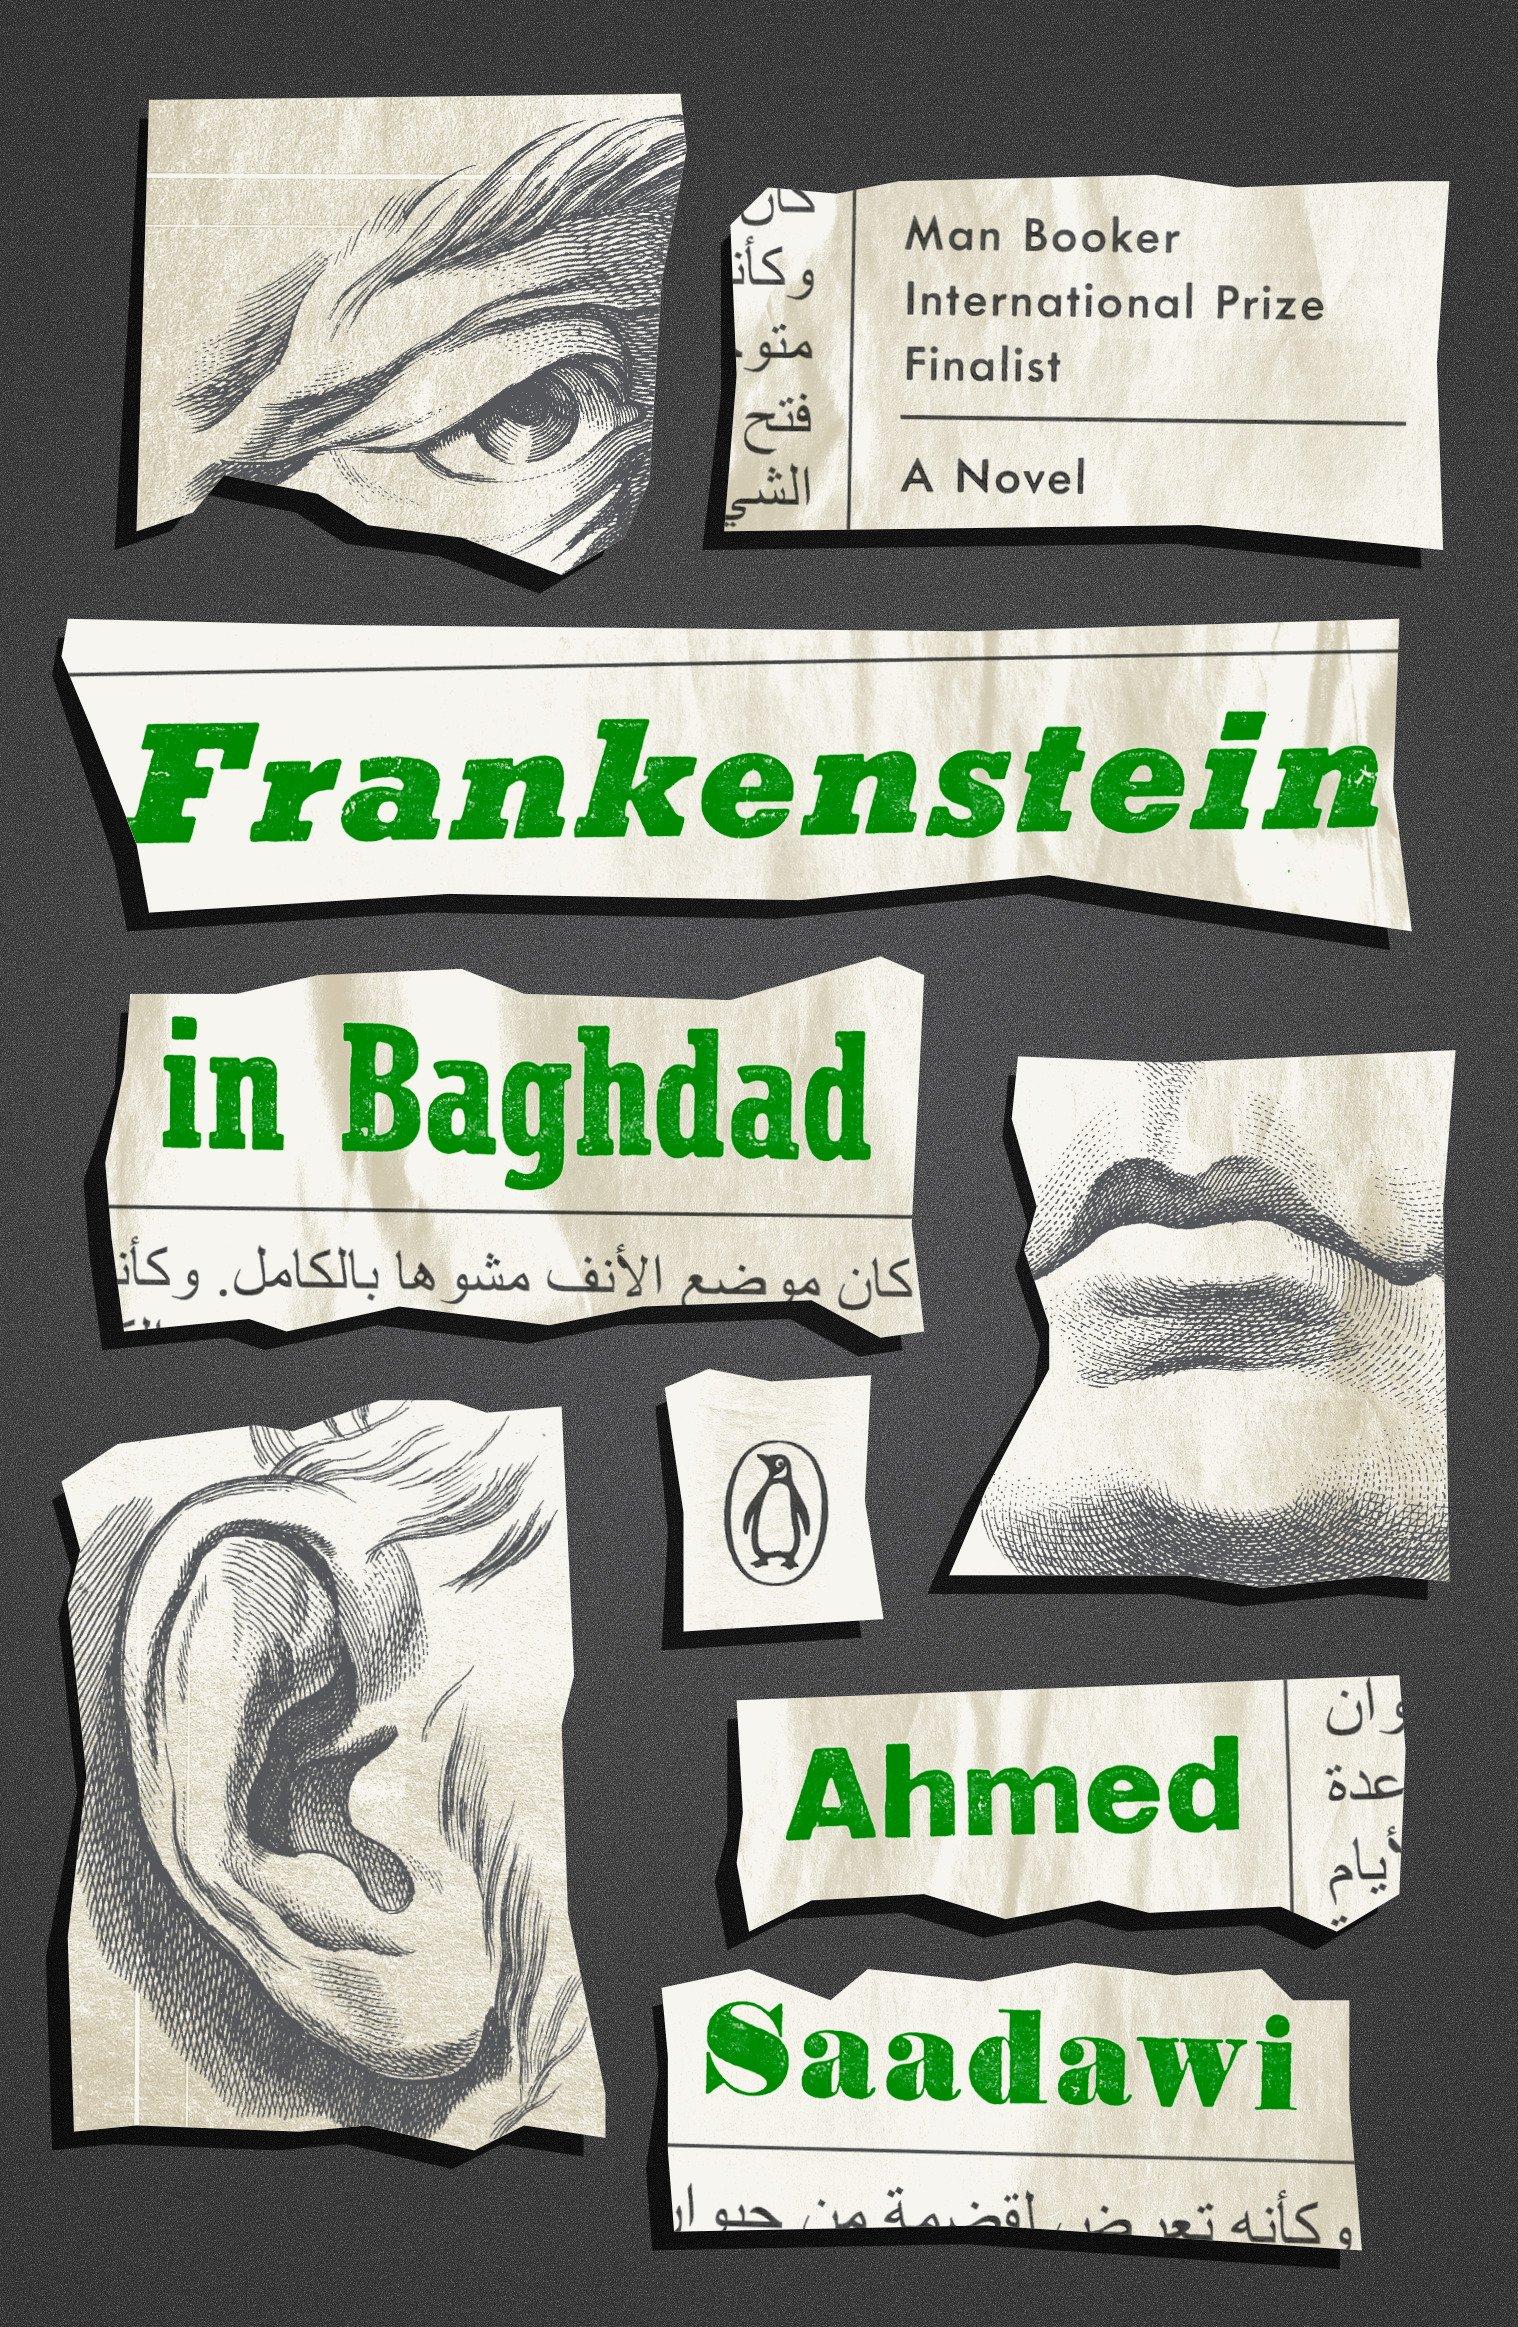 Frankenstein in Baghdad: A Novel Paperback – January 23, 2018 Ahmed Saadawi Penguin Books 0143128795 Horror